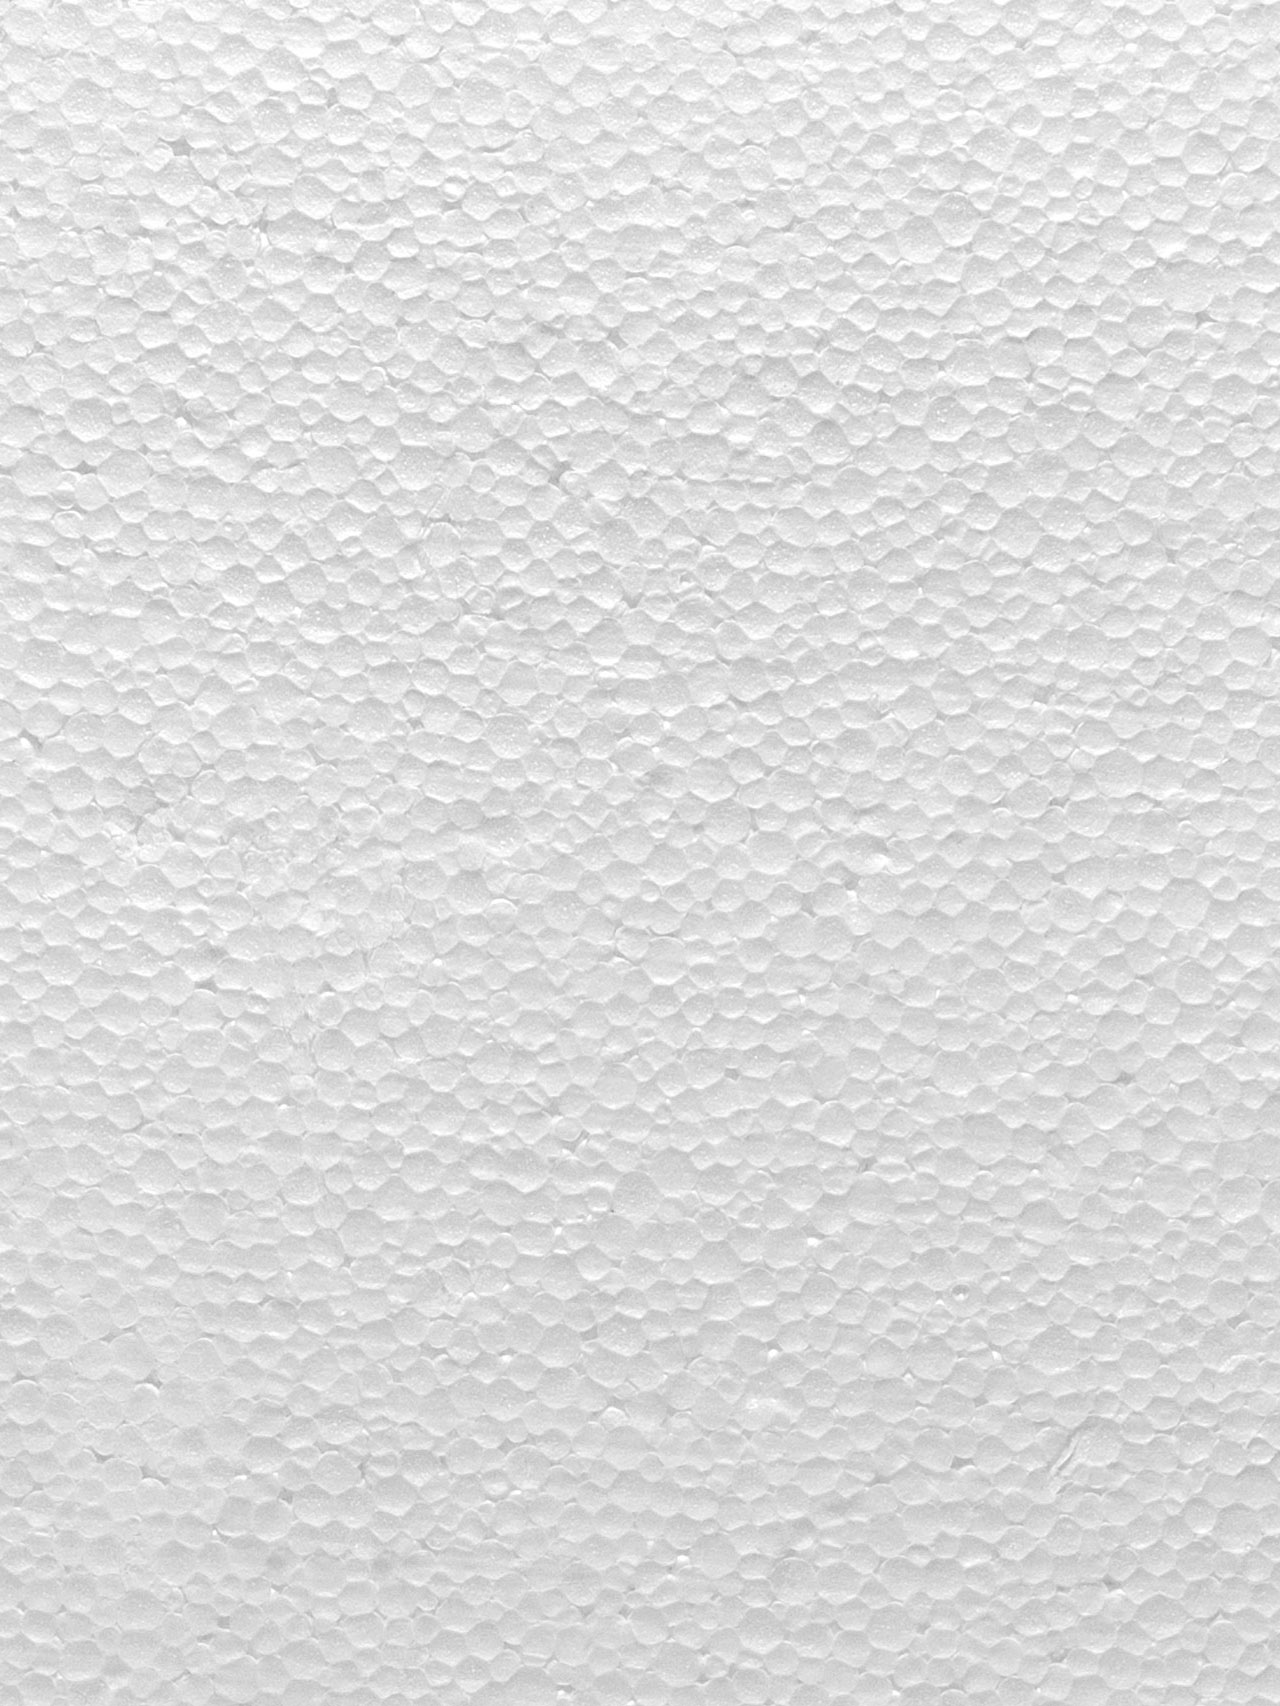 Styropor-Textur